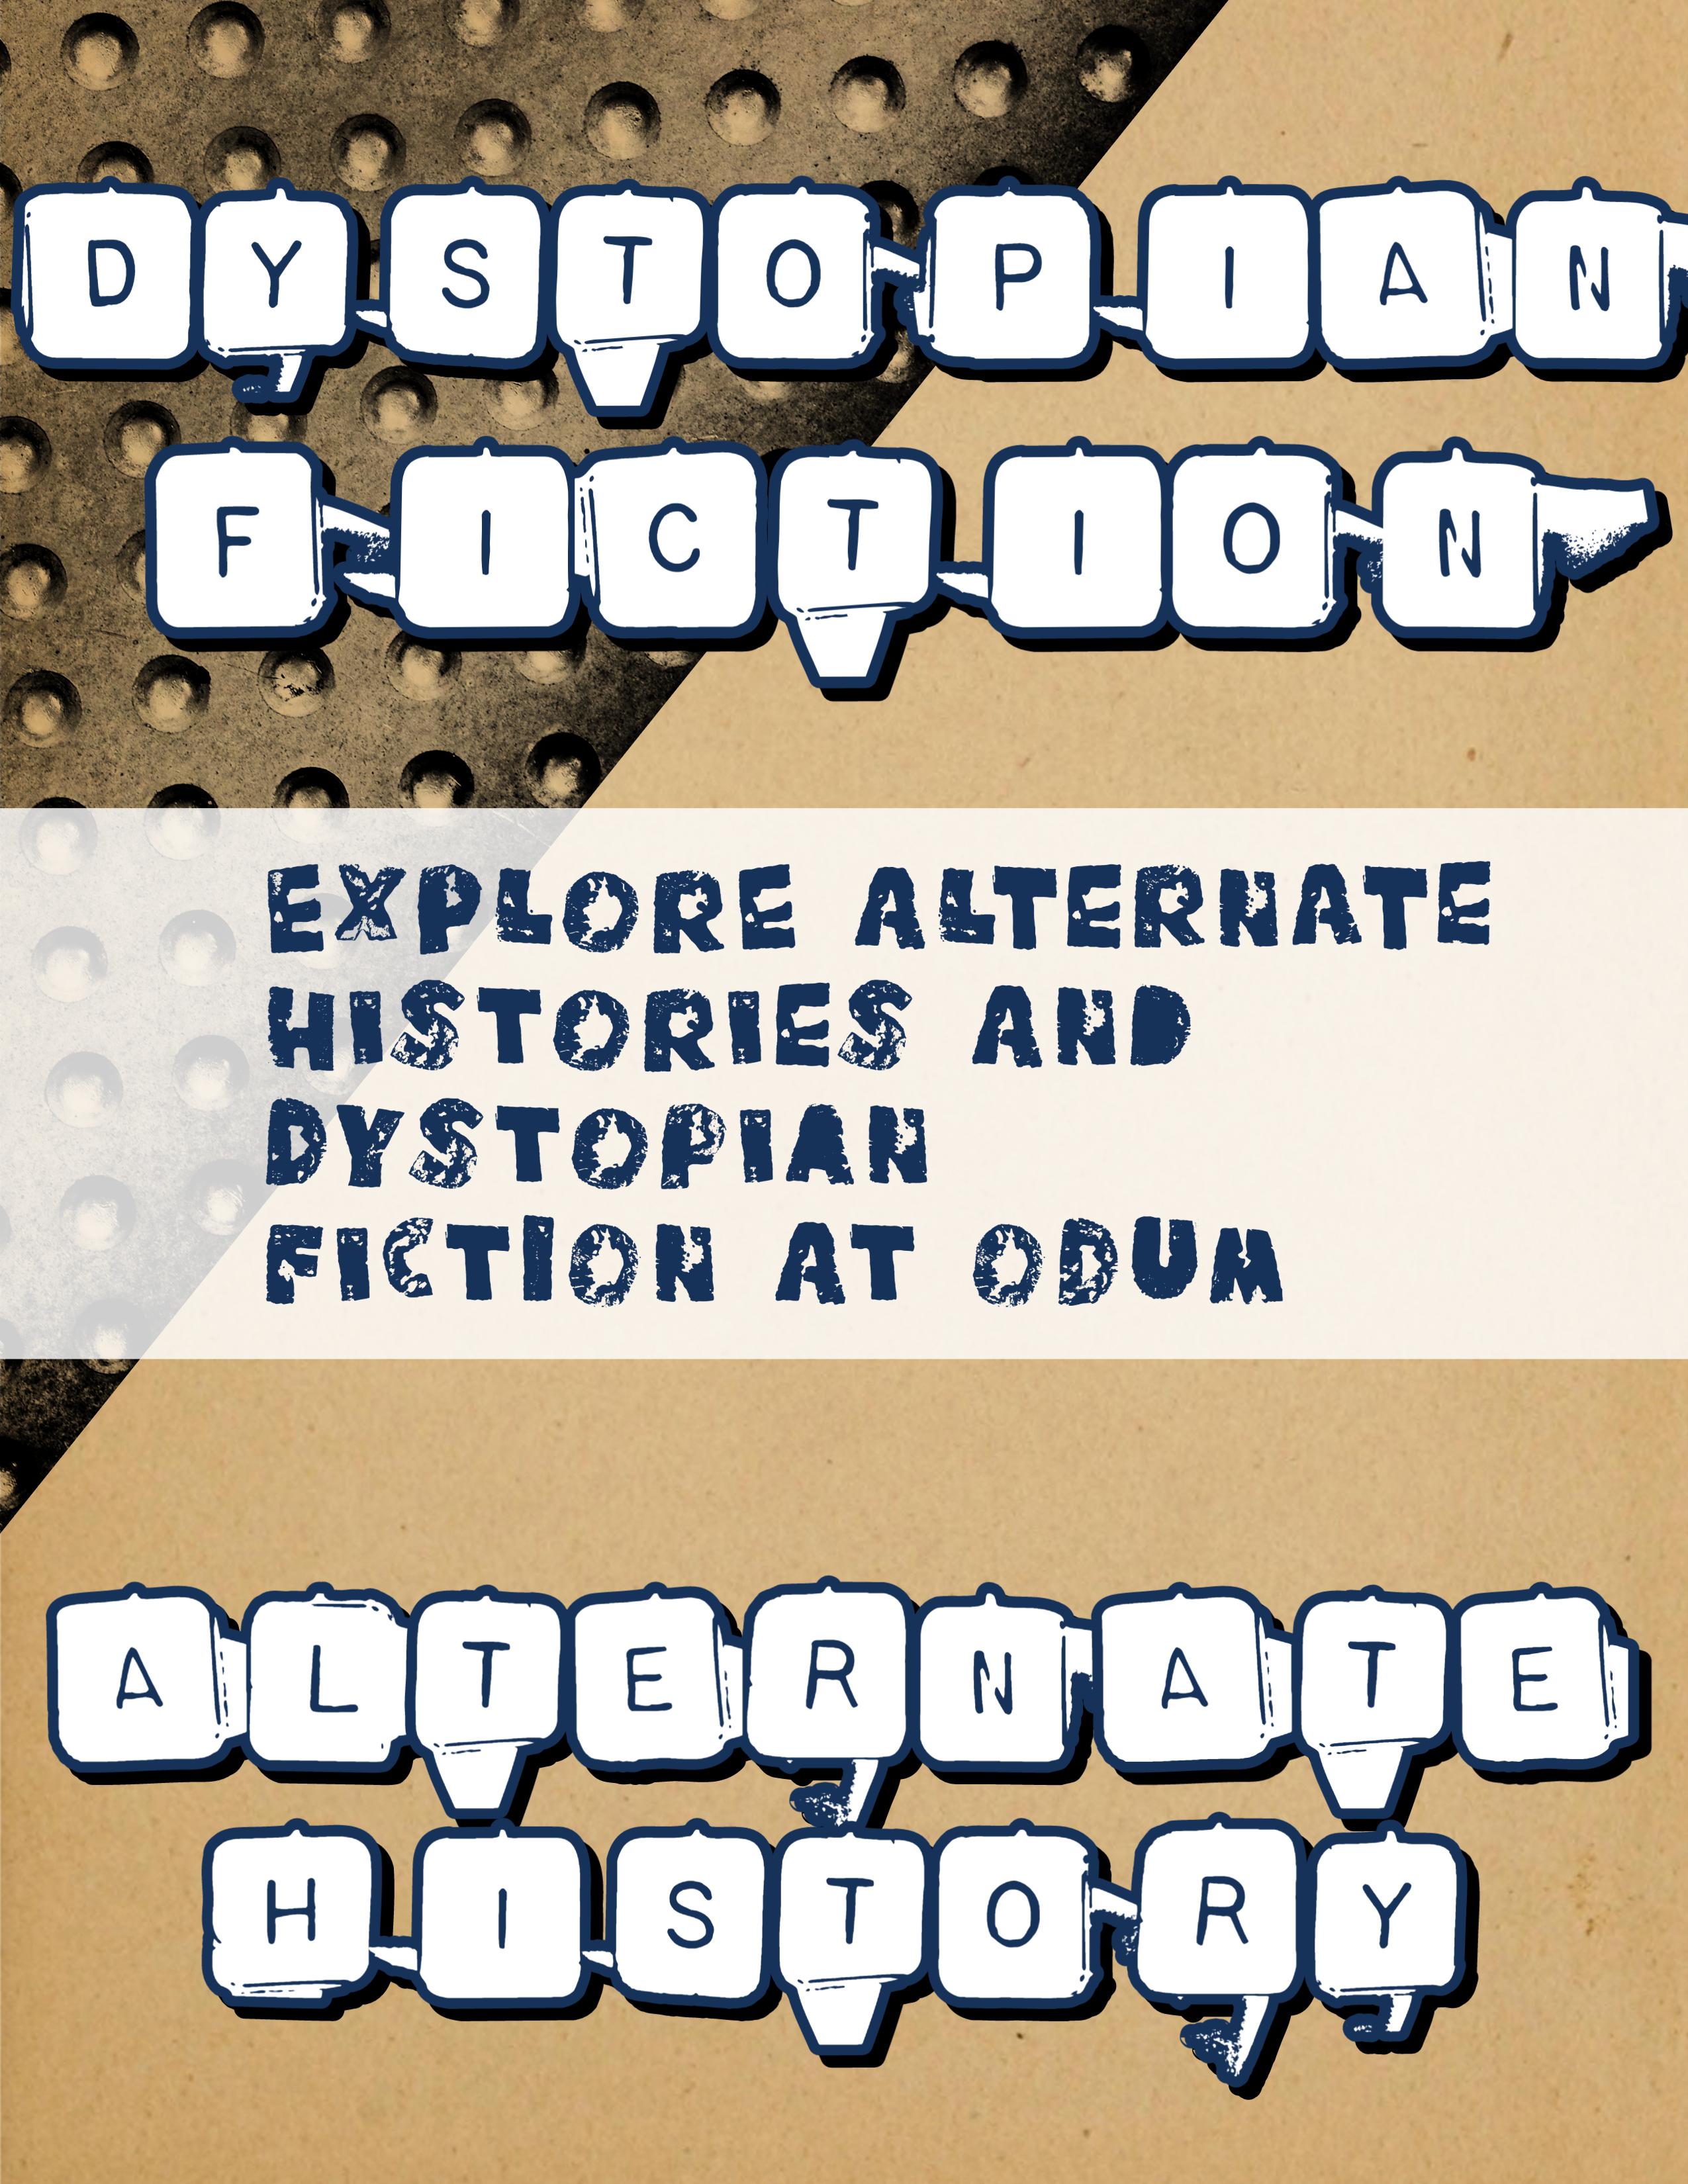 Dystopian Fiction Explore. Explore alternate histories and dystopian fiction at Odum. Alternate History